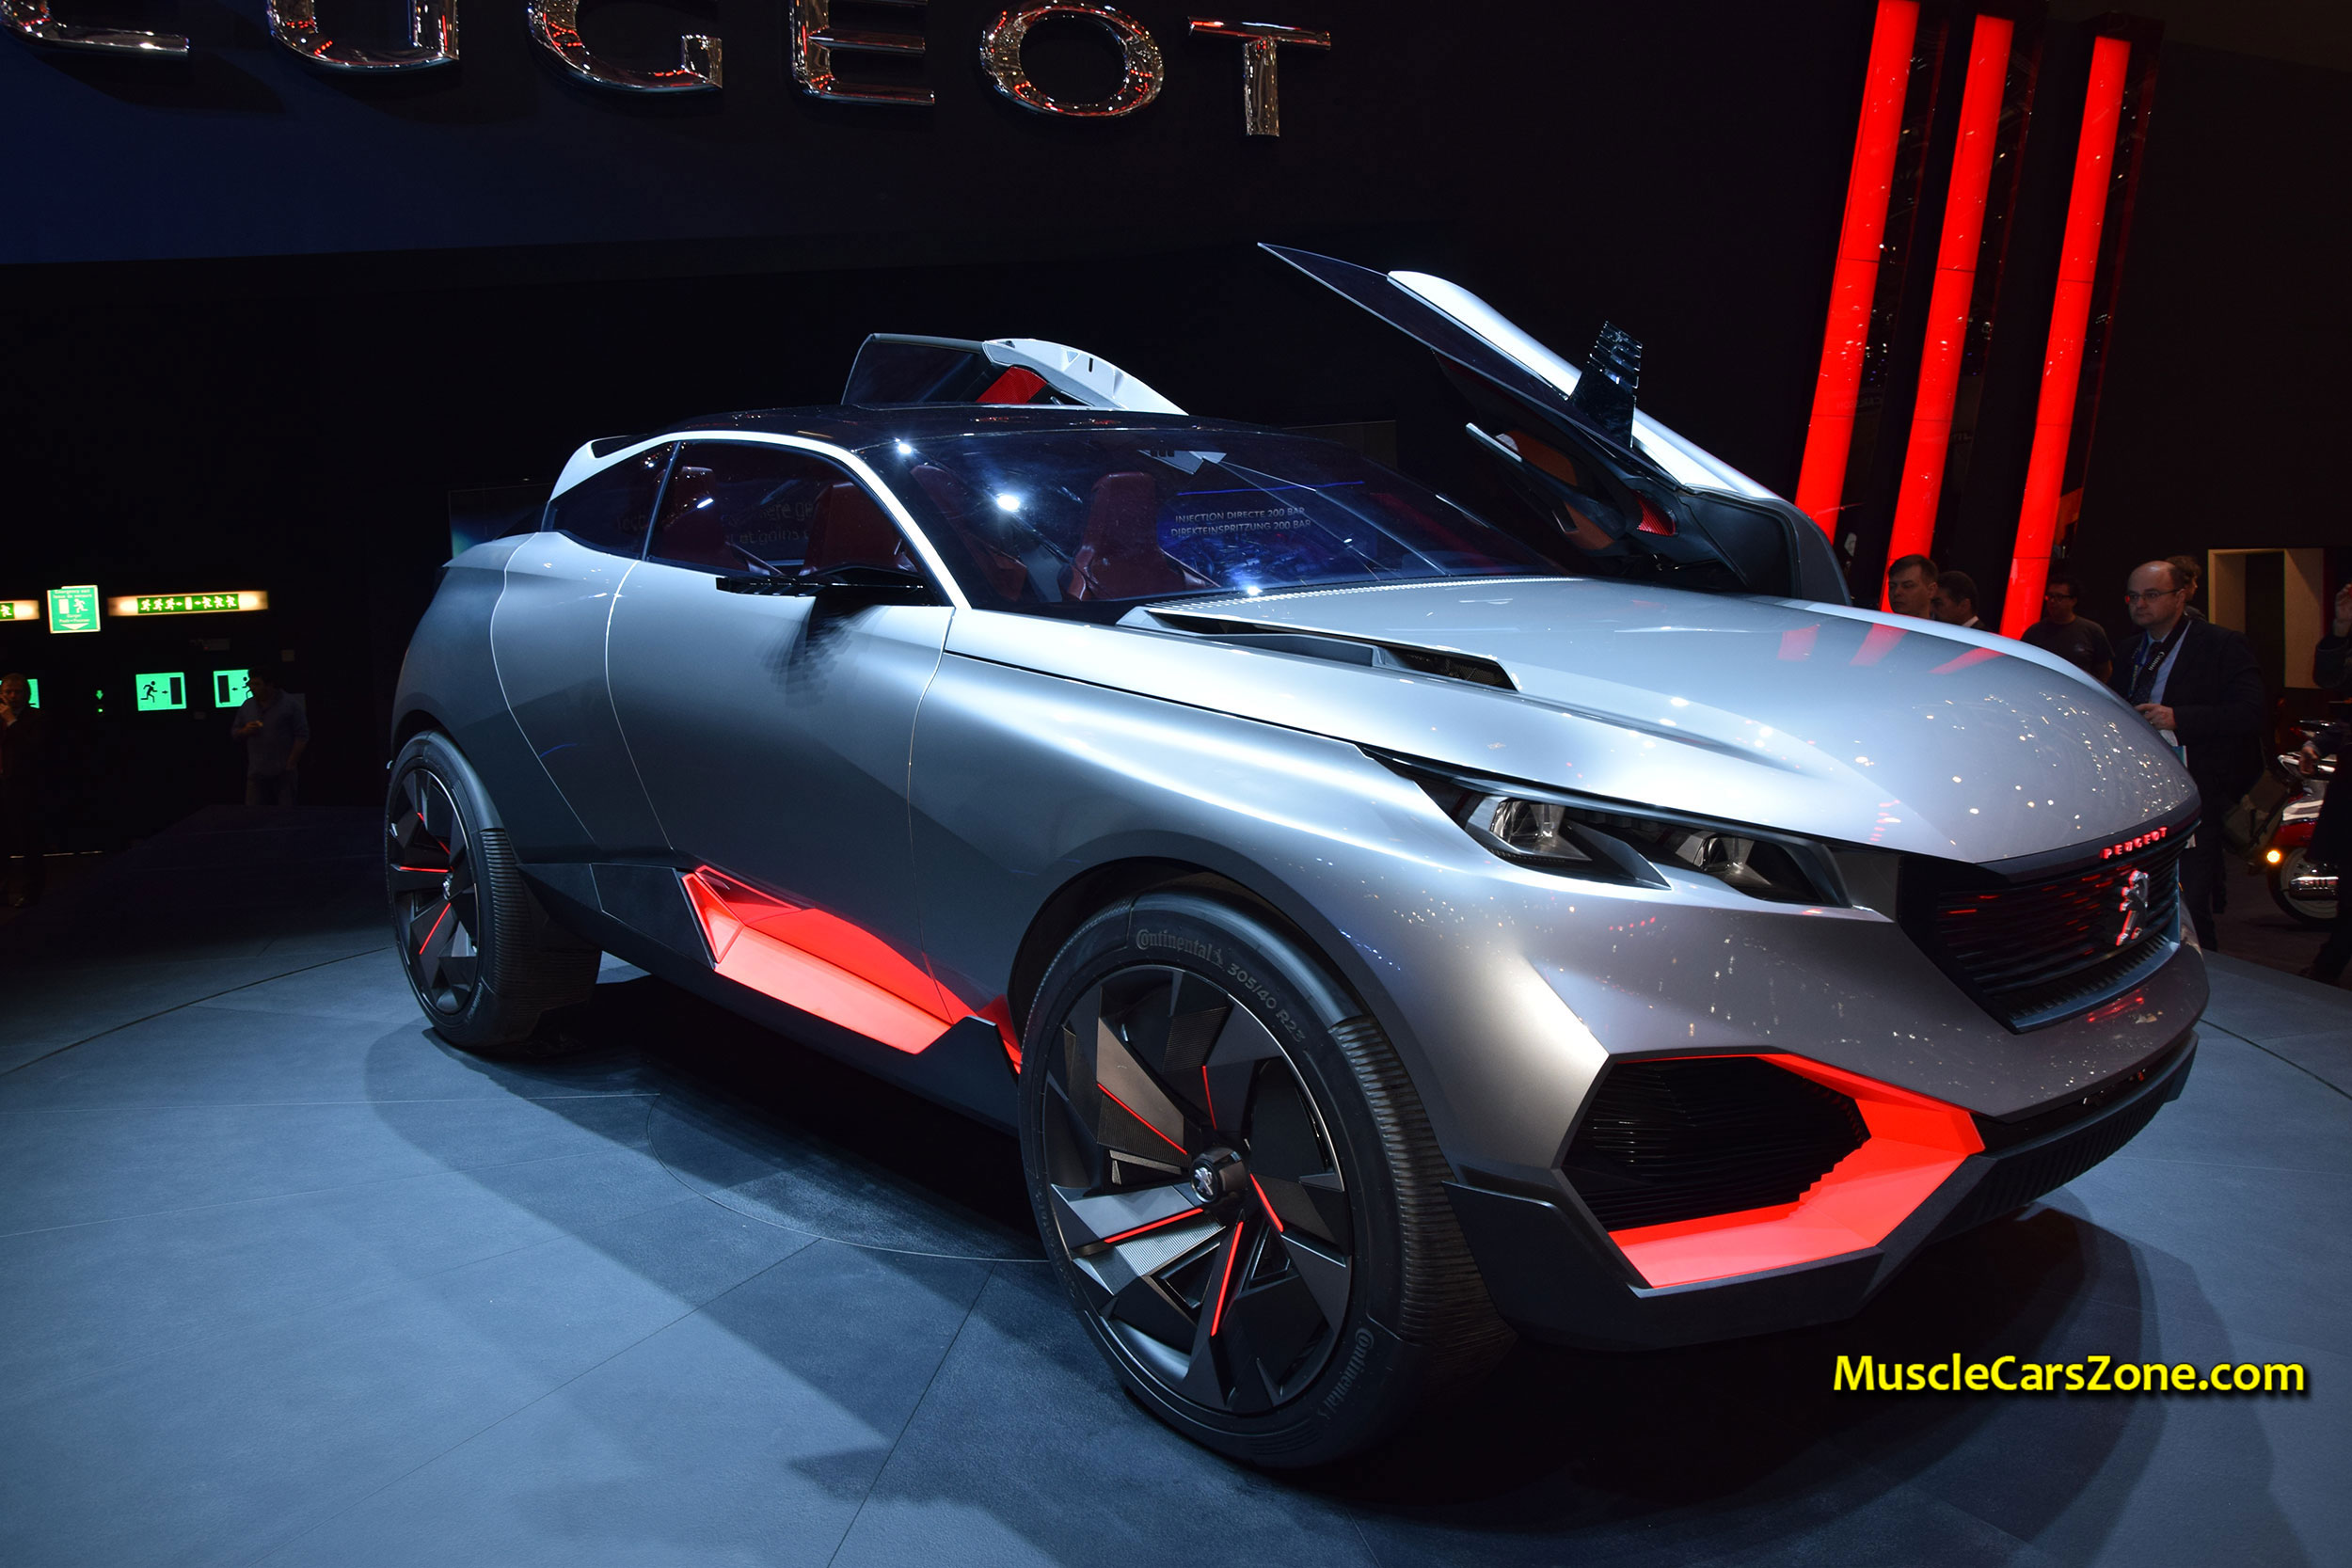 2015 peugeot quartz suv concept futuristic car 05 2015 geneva motor show muscle cars zone. Black Bedroom Furniture Sets. Home Design Ideas